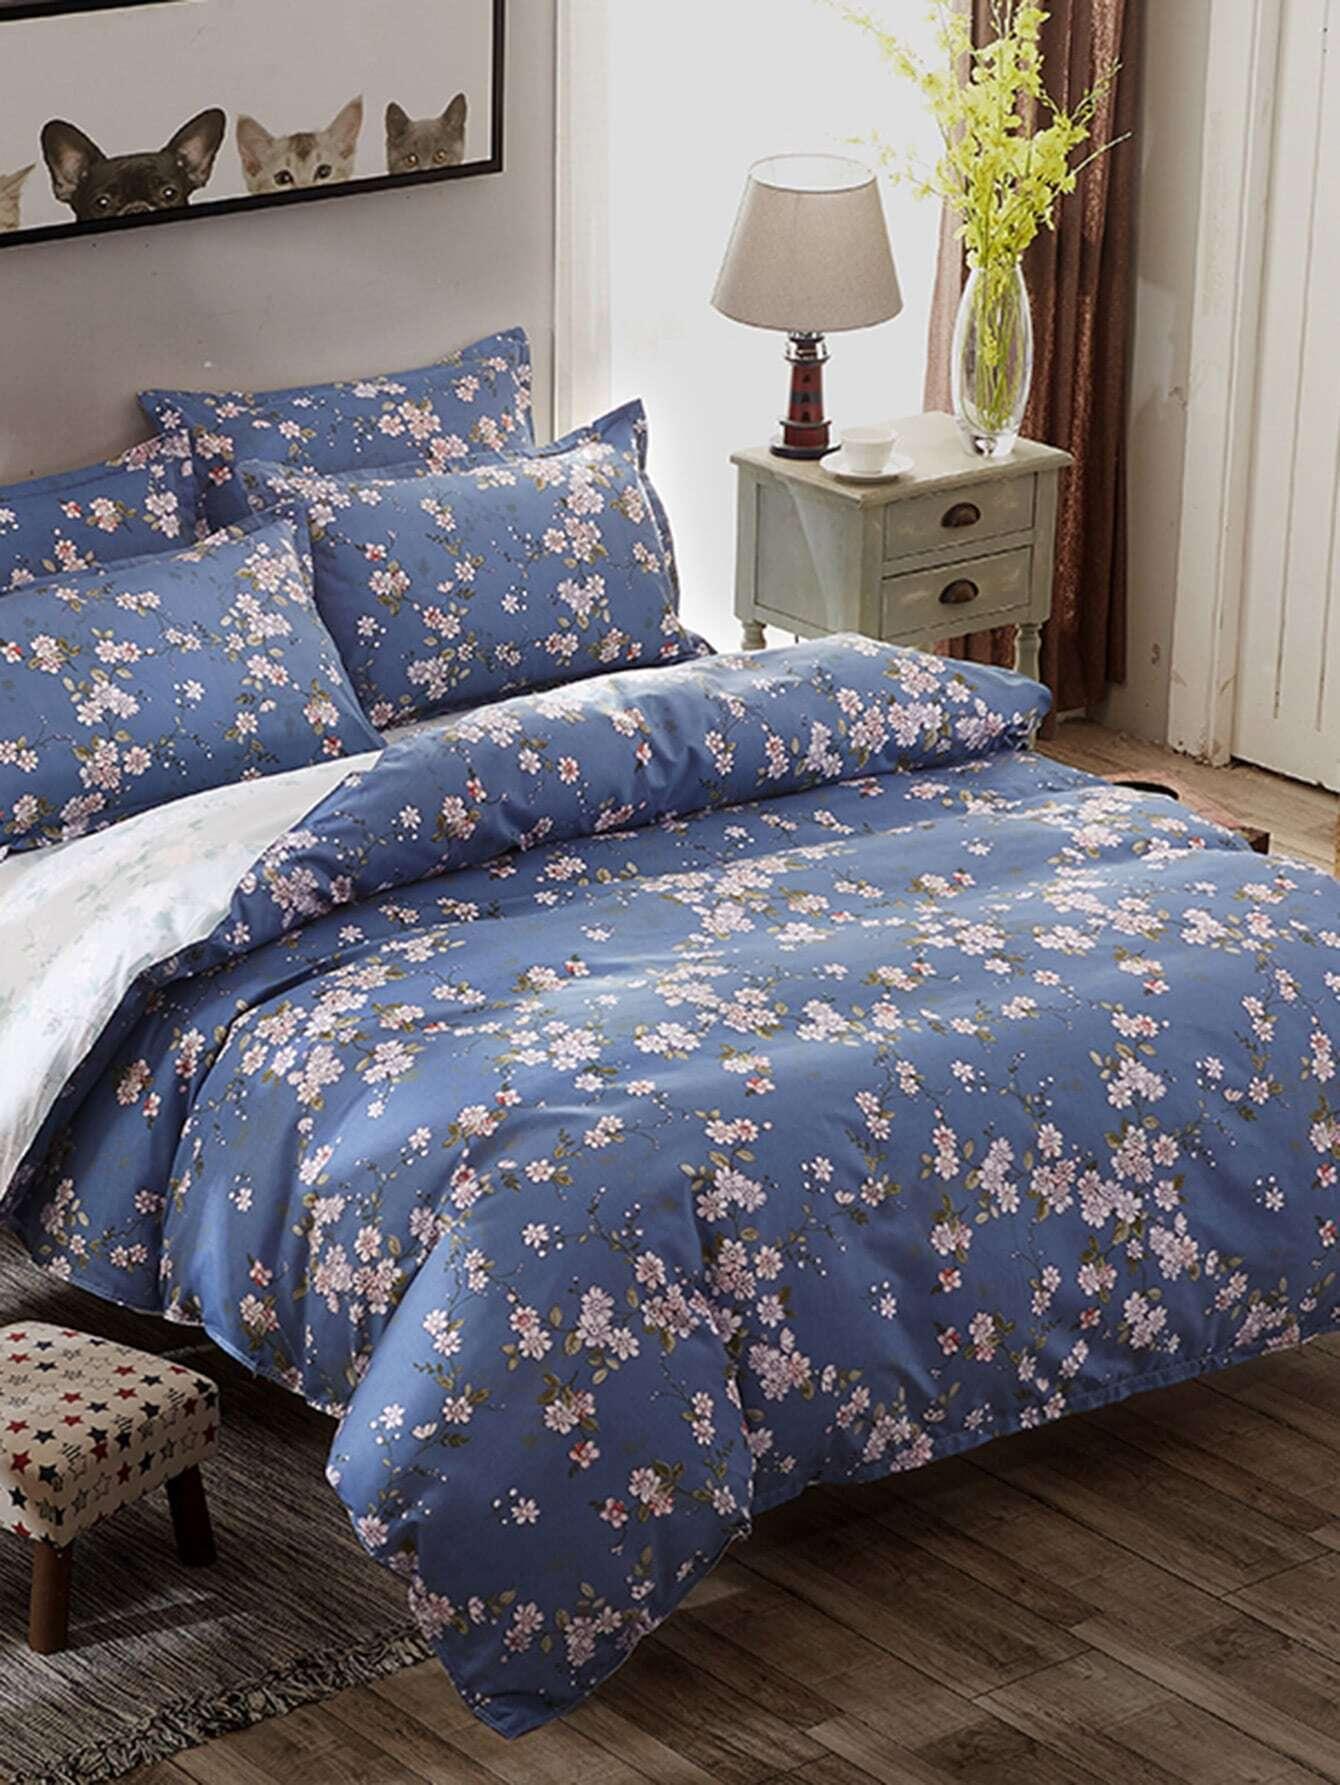 1.2m 4Pcs Flower Print Duvet Cover Set